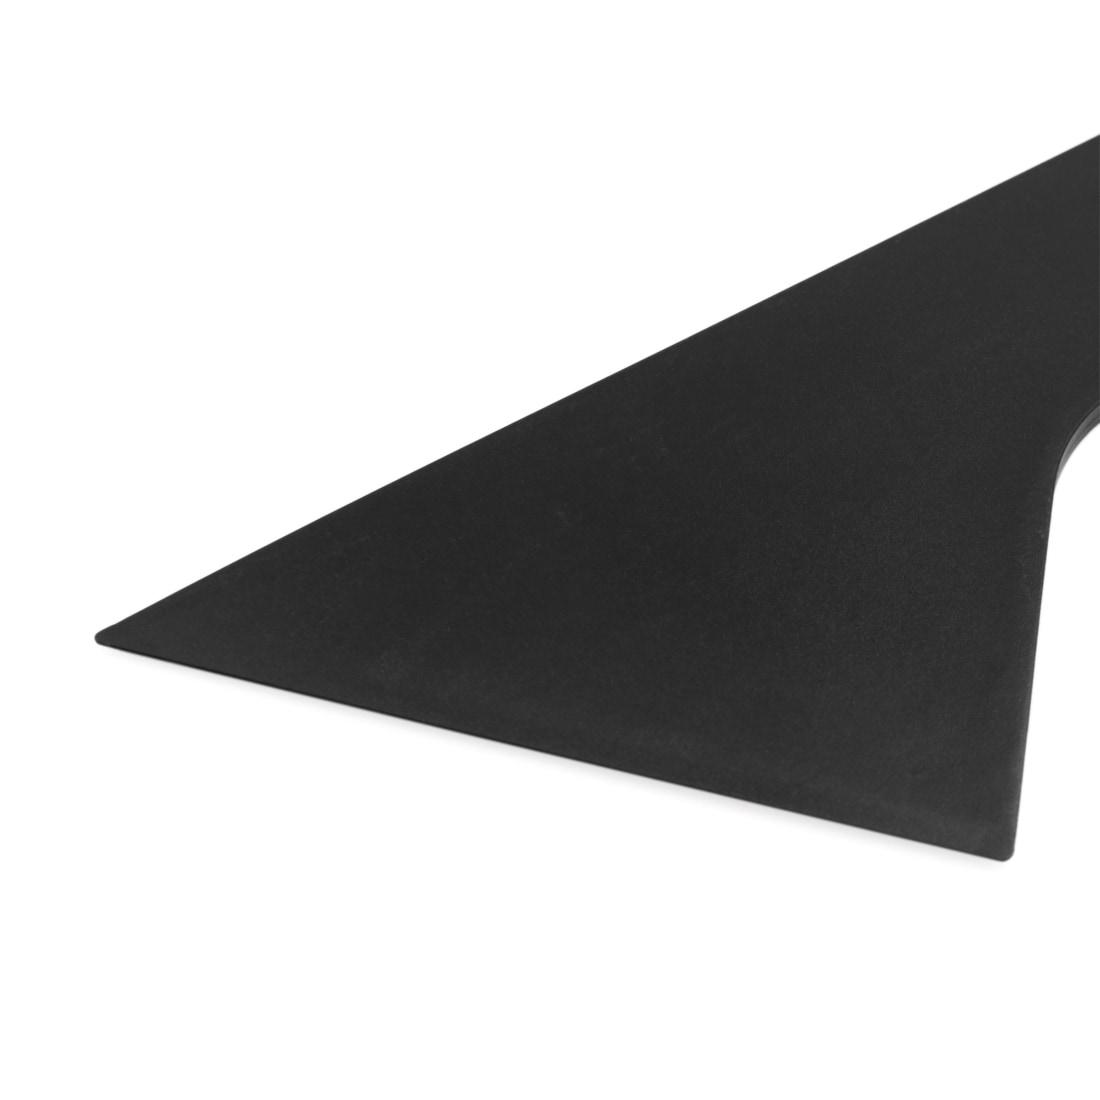 Windscreen Ice Scraper Red And Black Flexible